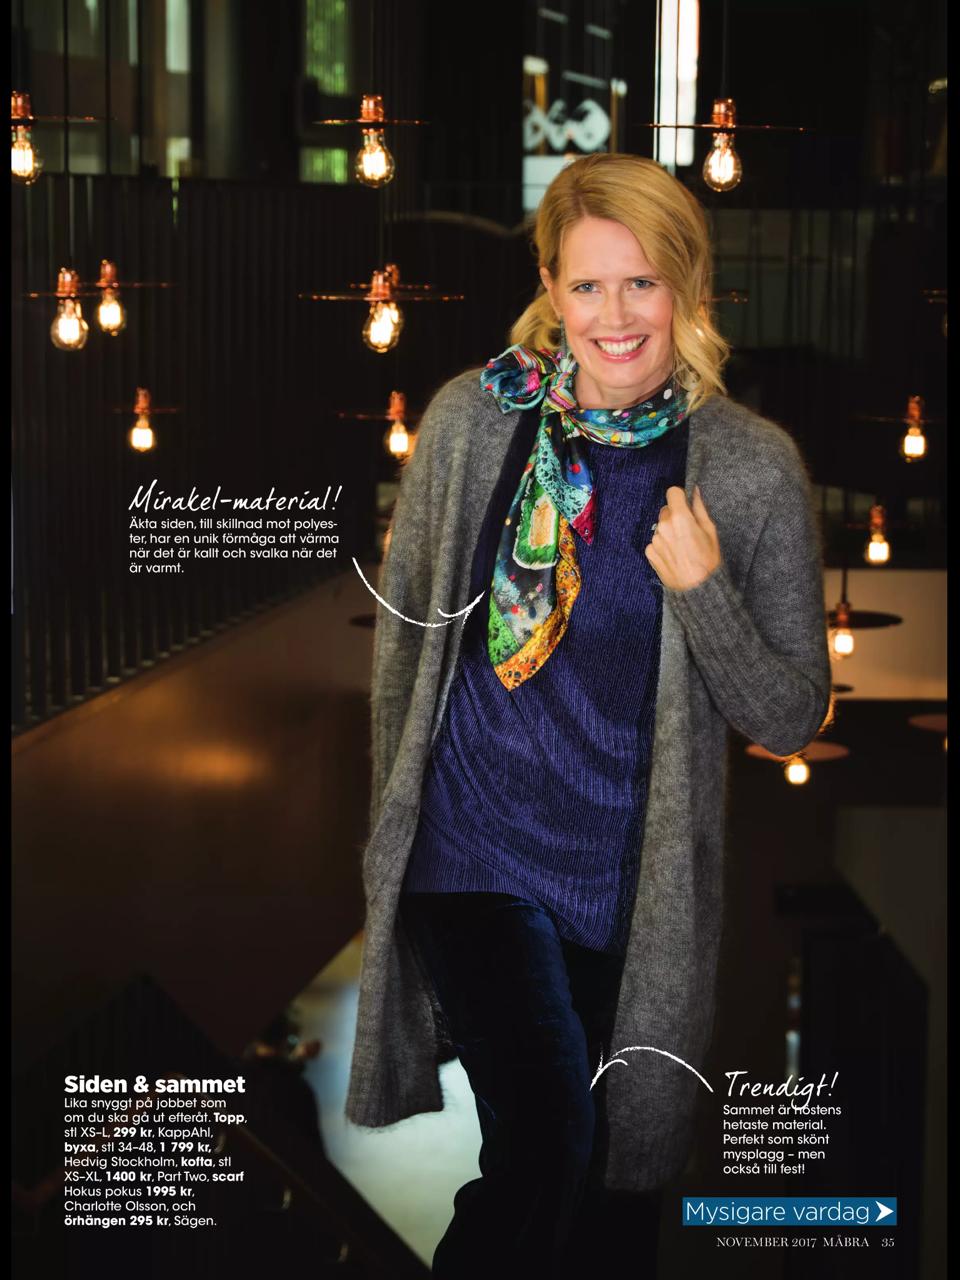 charlotte_olsson_art_konst_champagnekonst_champagnescarf_måbra_svenskdesign_champagne_scarf_siden_design